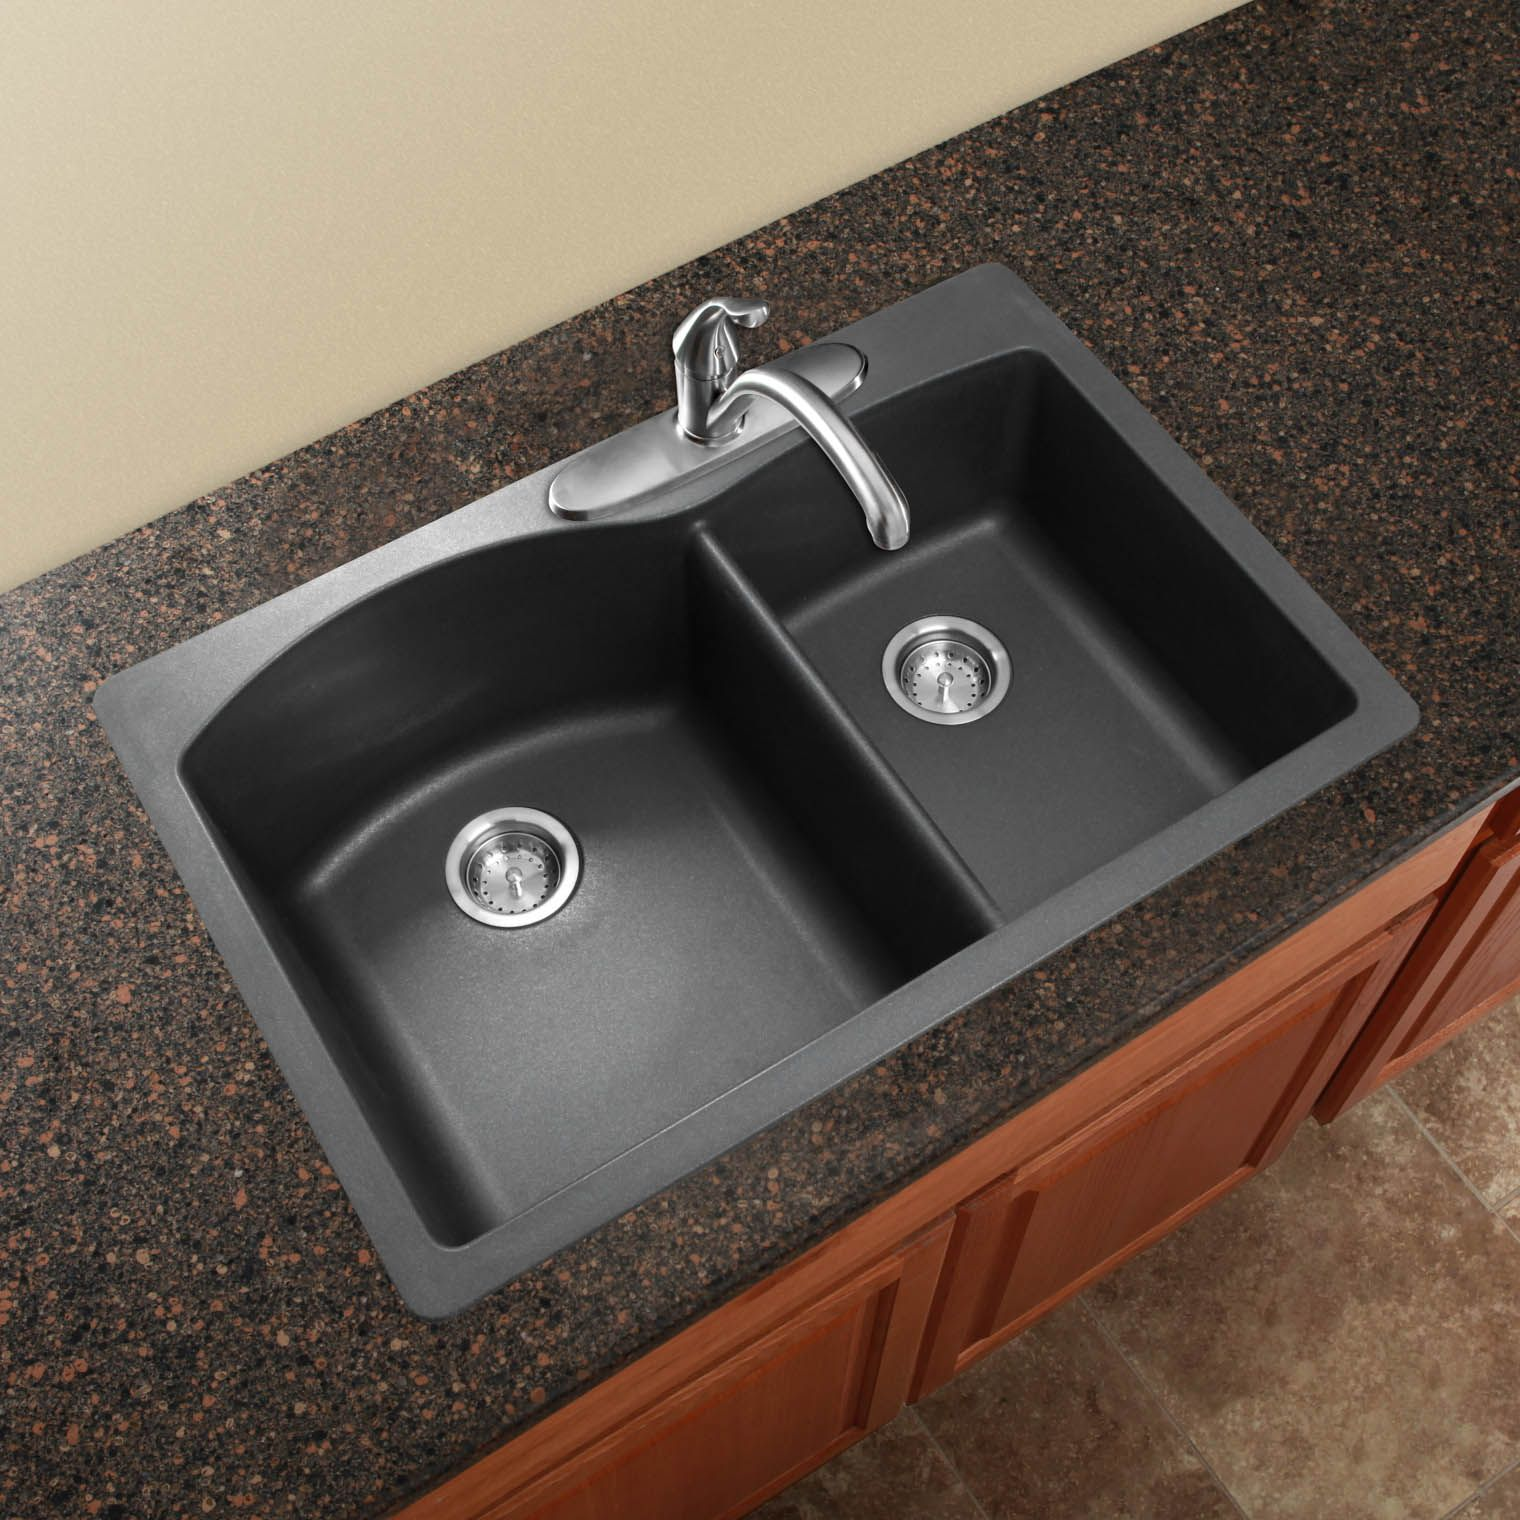 Blanco America diamond SILGRANIT black kitchen sink